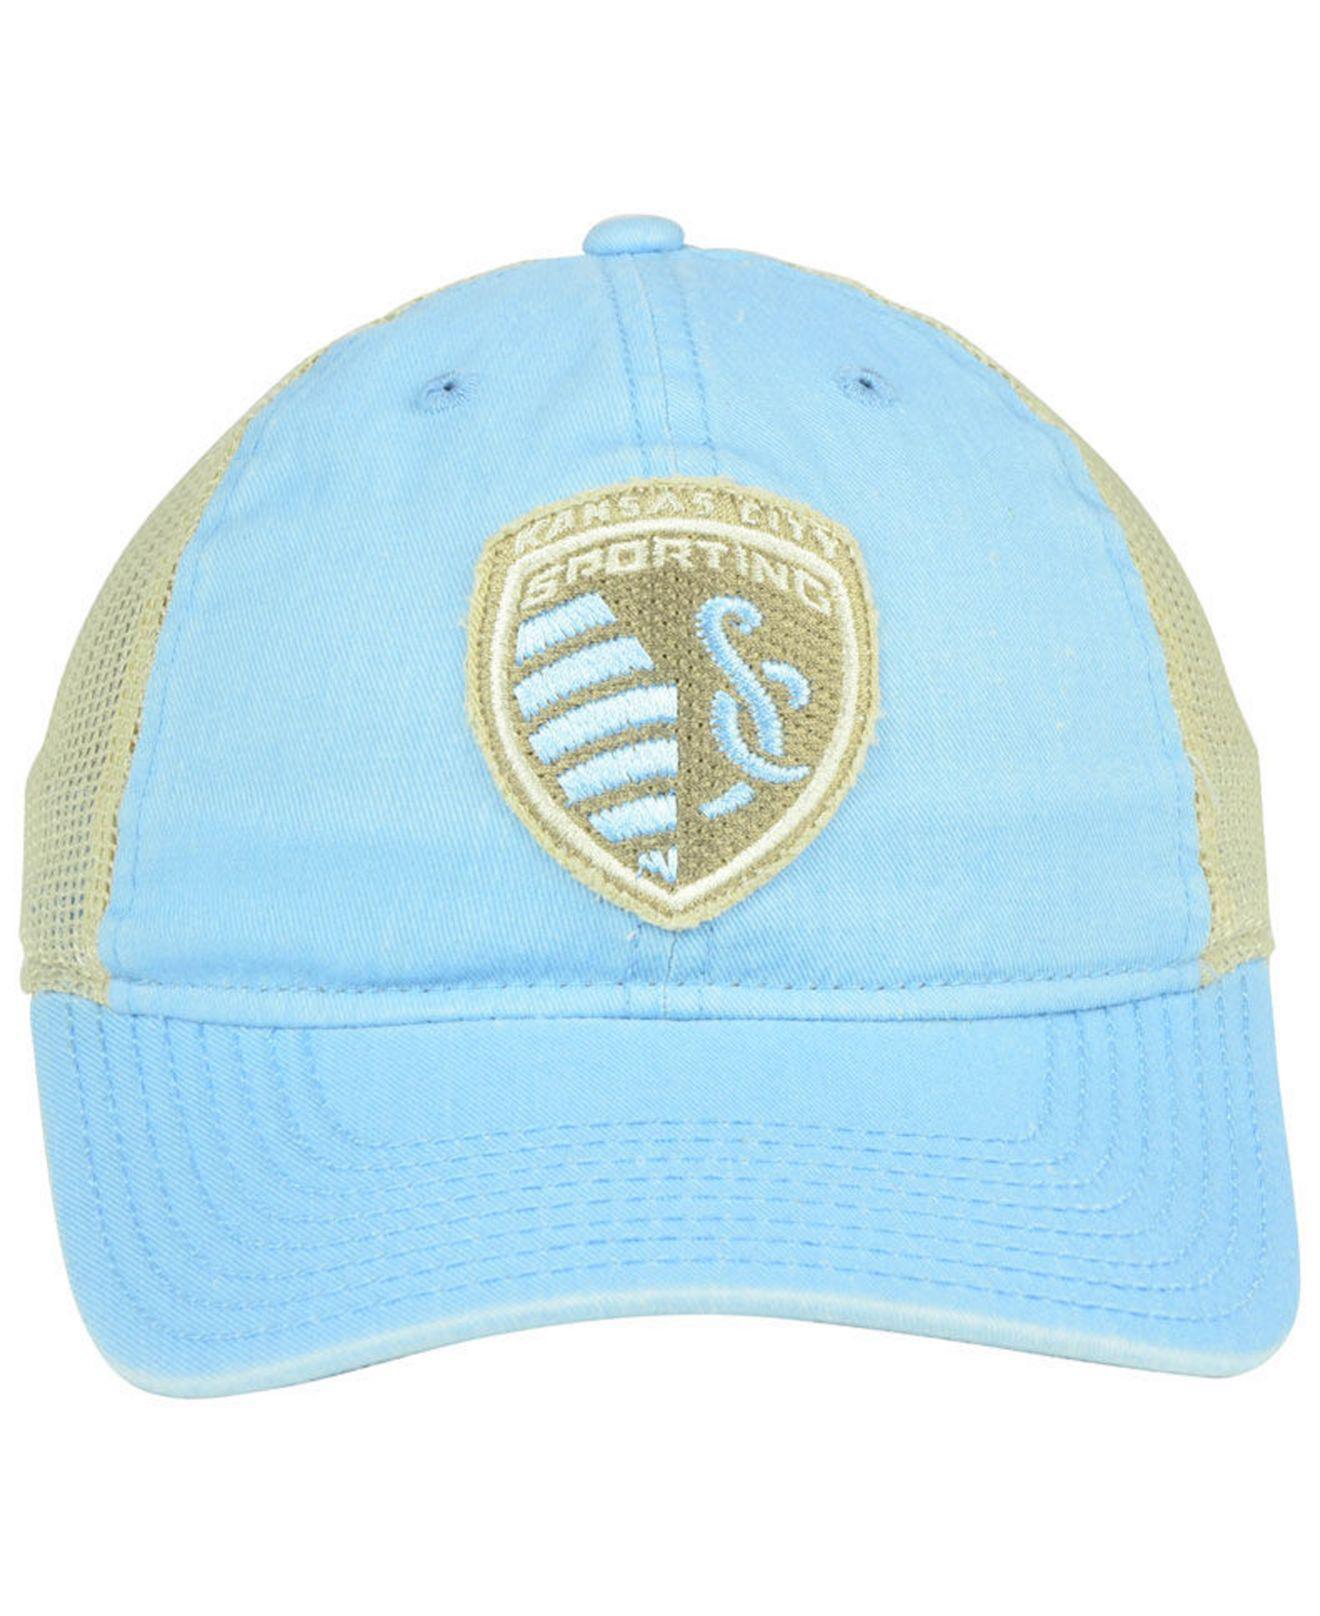 sale retailer 2f5f2 ae9d8 ... czech lyst adidas sporting kansas city bleached trucker cap in blue  7e566 272ed